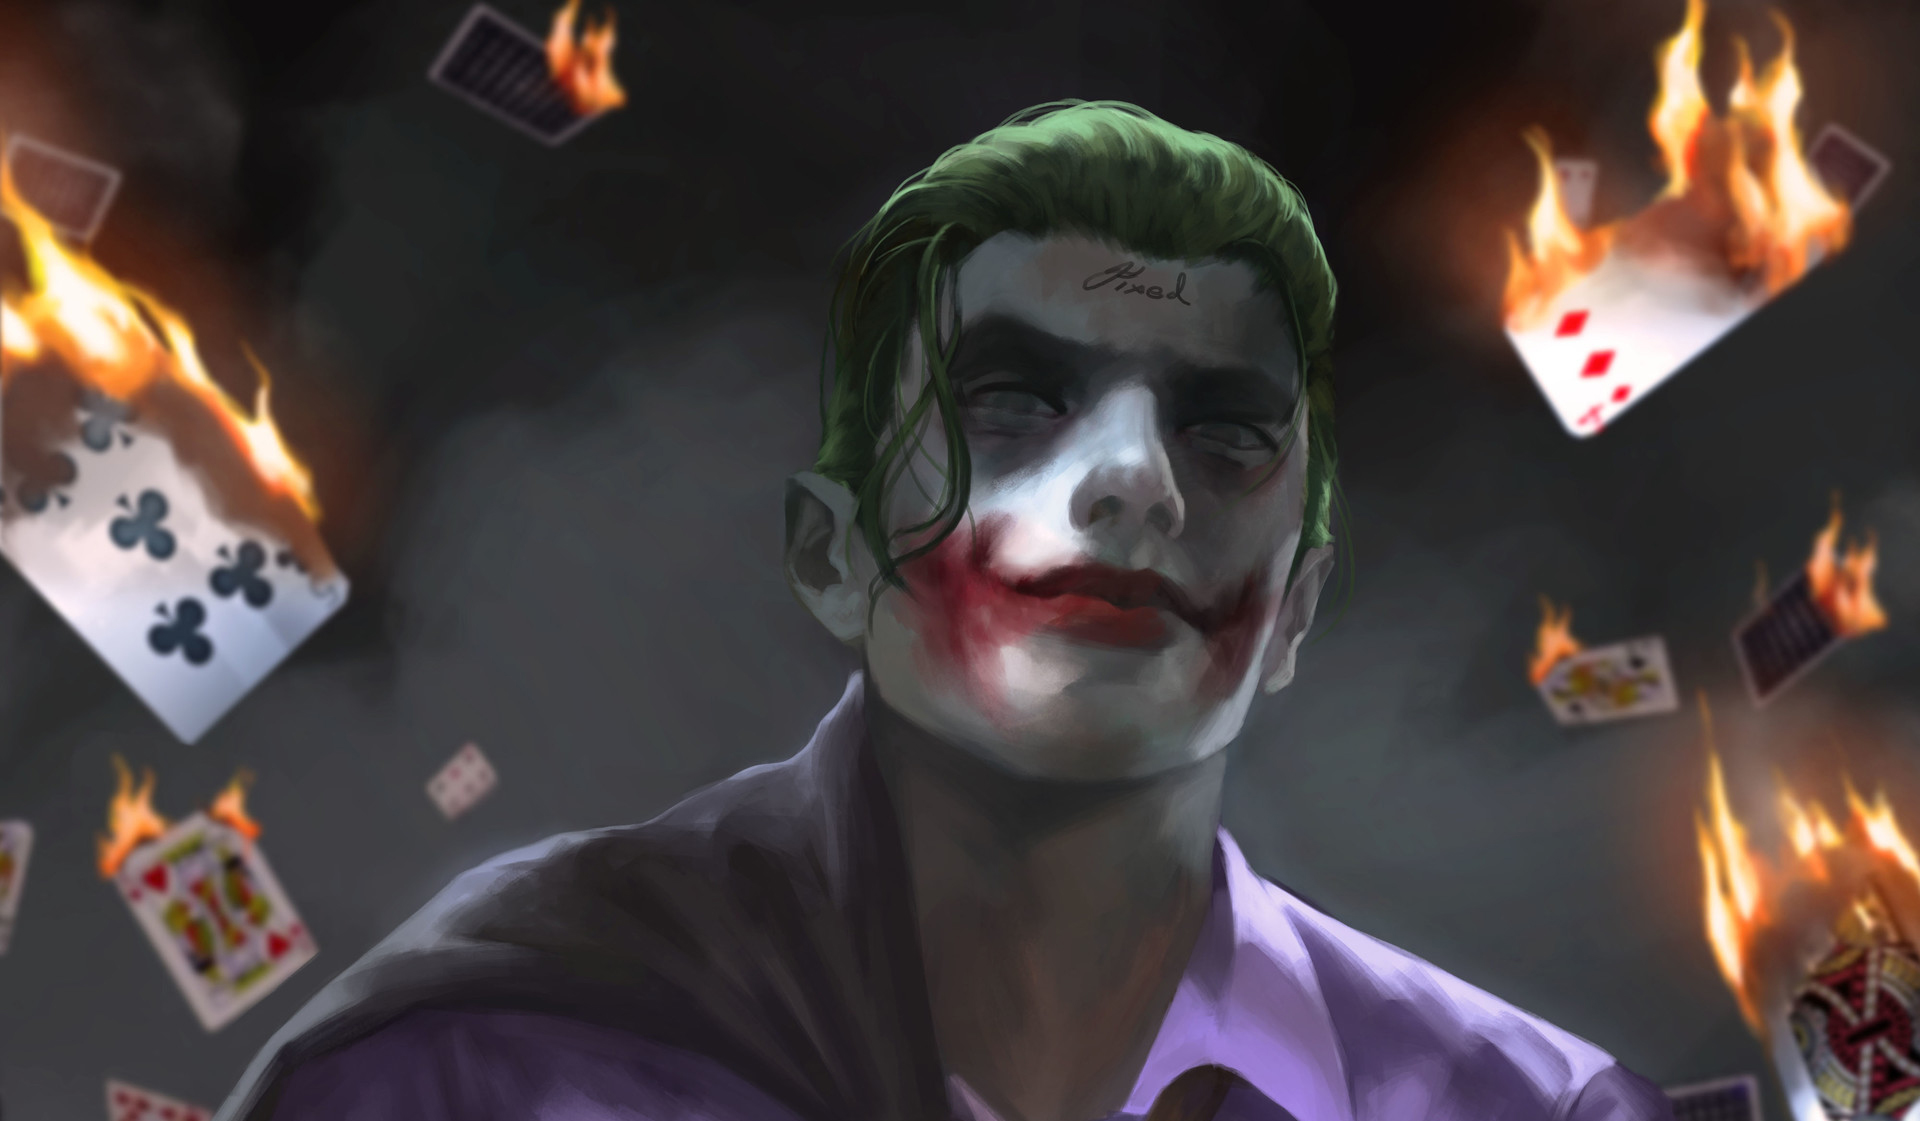 Joker artwork hd hd superheroes 4k wallpapers images for Joker wallpaper 4k